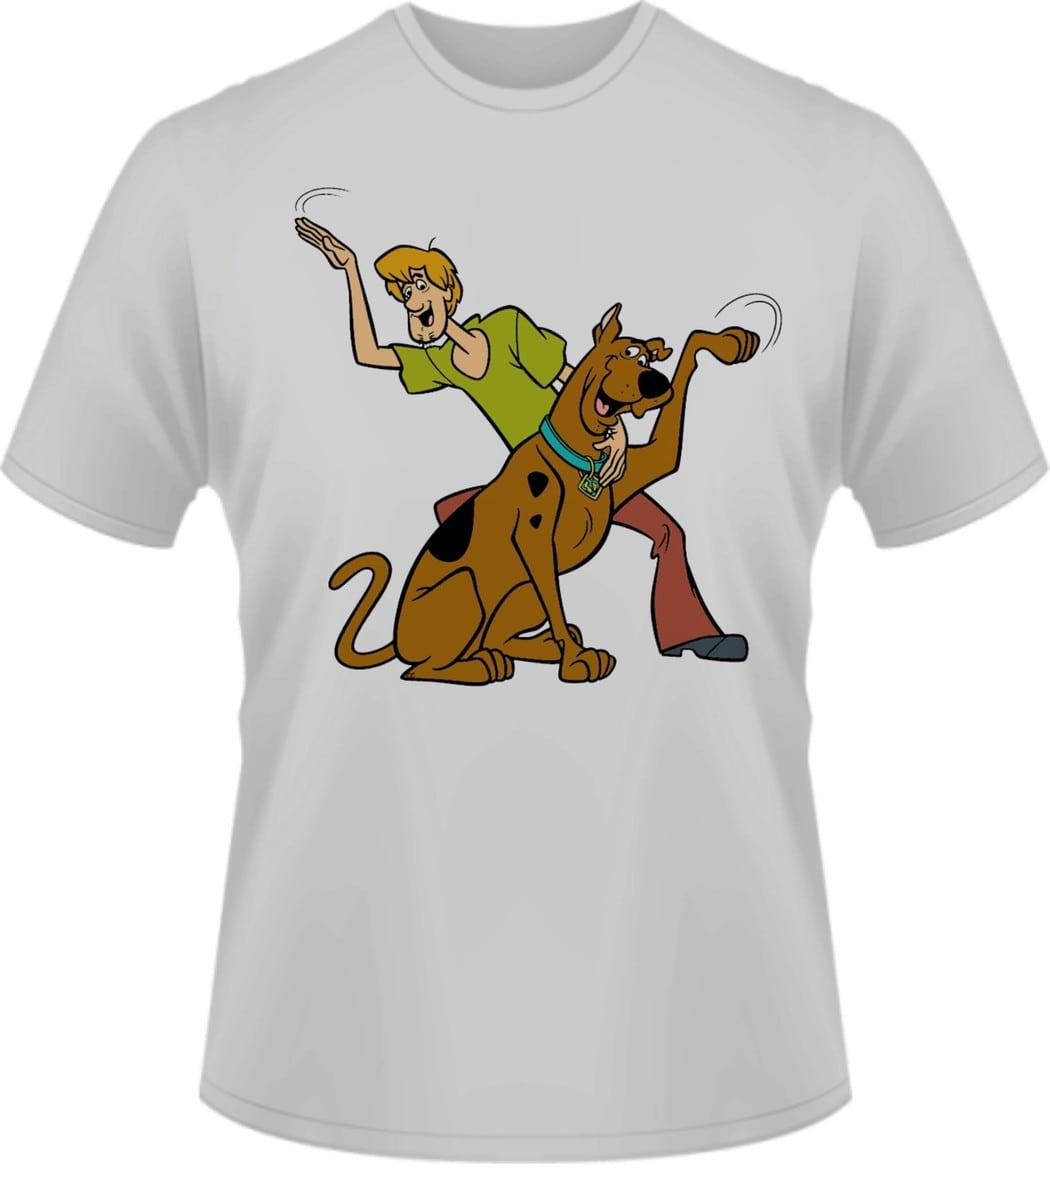 Camiseta Infantil Personalizada, Scooby